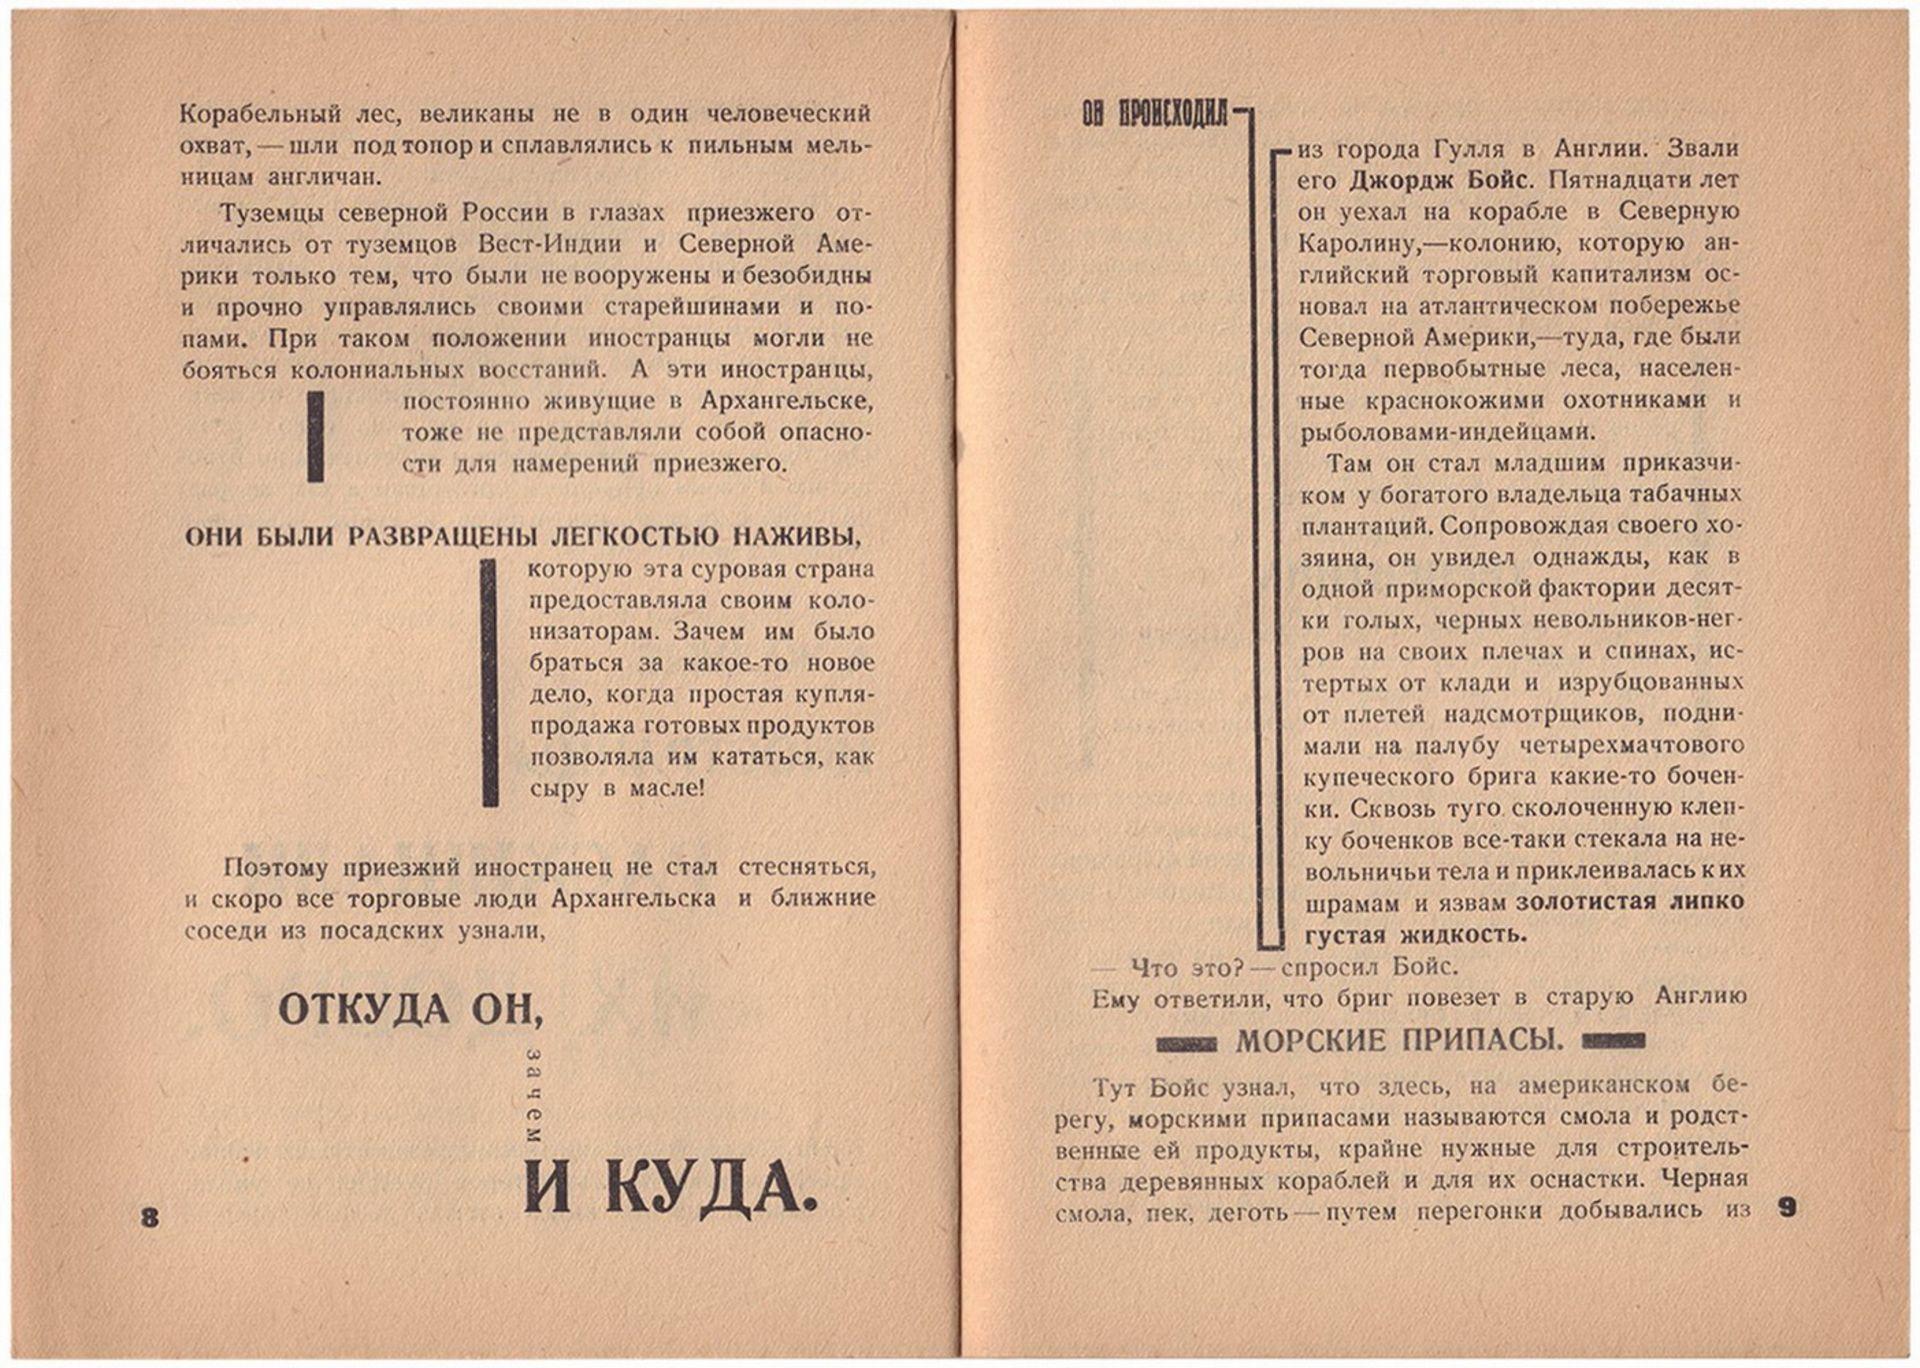 [Soviet art]. Ievlev, S. Our north Turpentine / S.F. Ievlev. - Arkhangelsk, 1931. - 80 pp.: ill.; 29 - Bild 3 aus 6